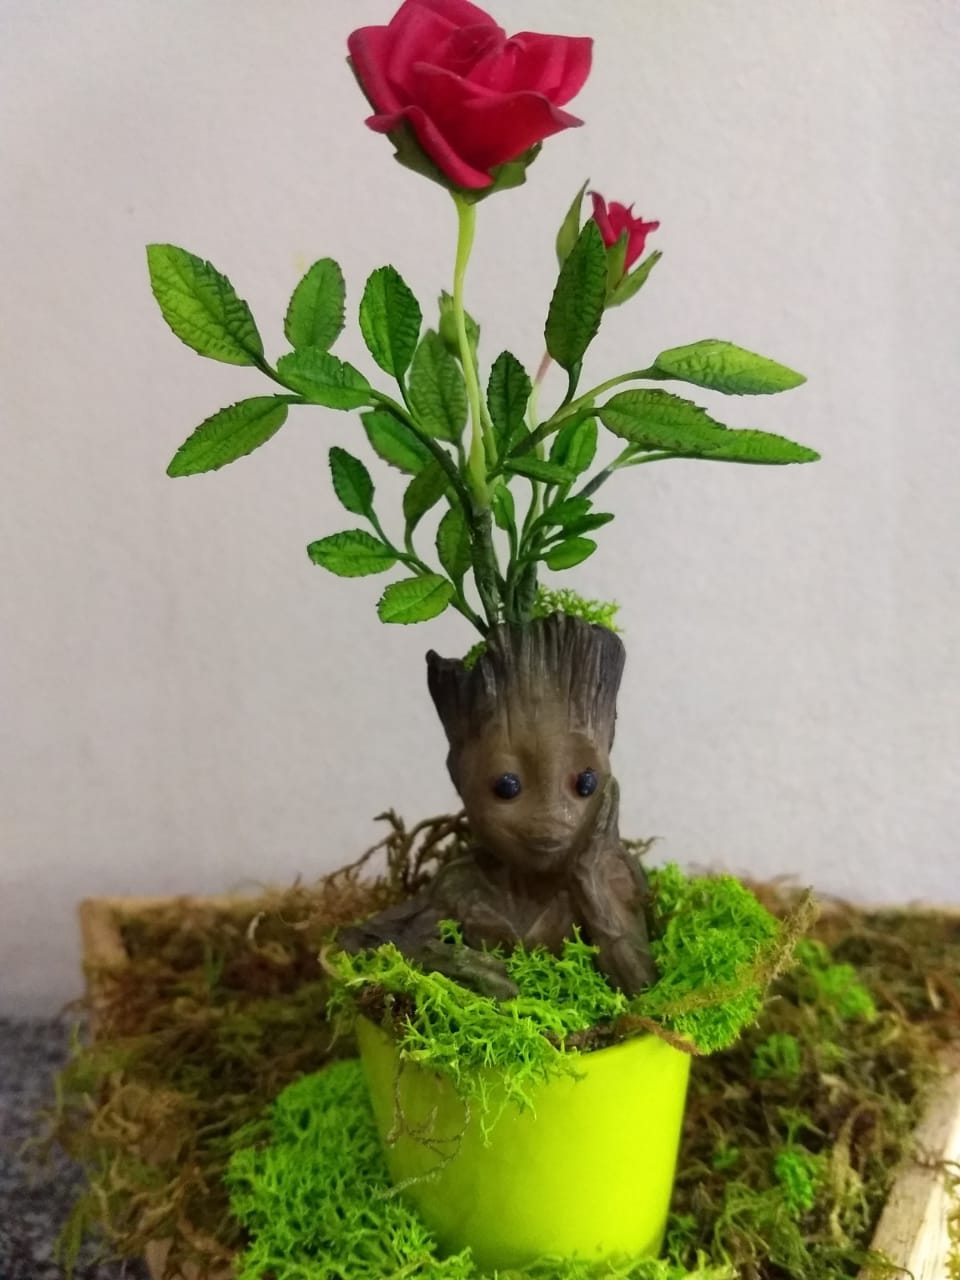 Groot + roseira míni + vasinho magnético